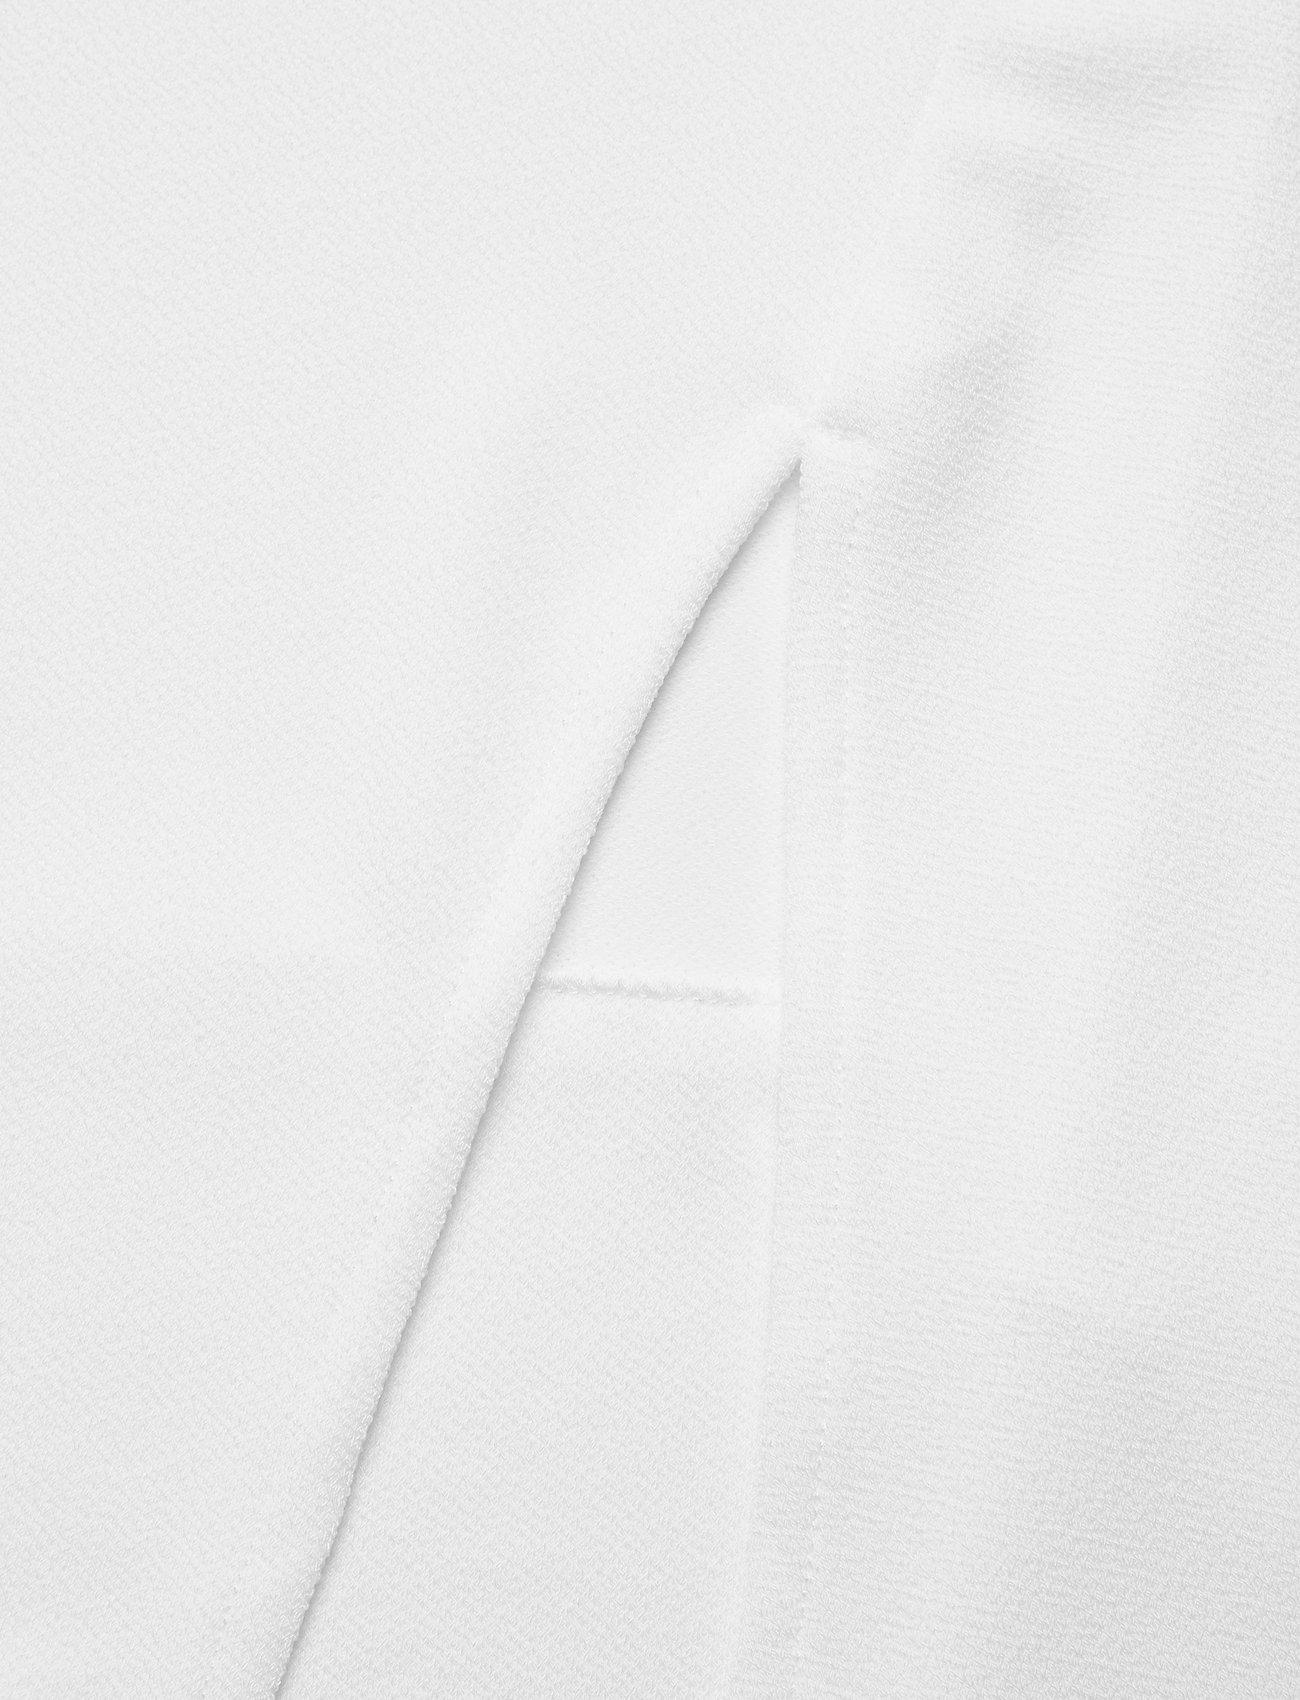 Coaxana (Soft White) (1104.35 kr) - By Malene Birger